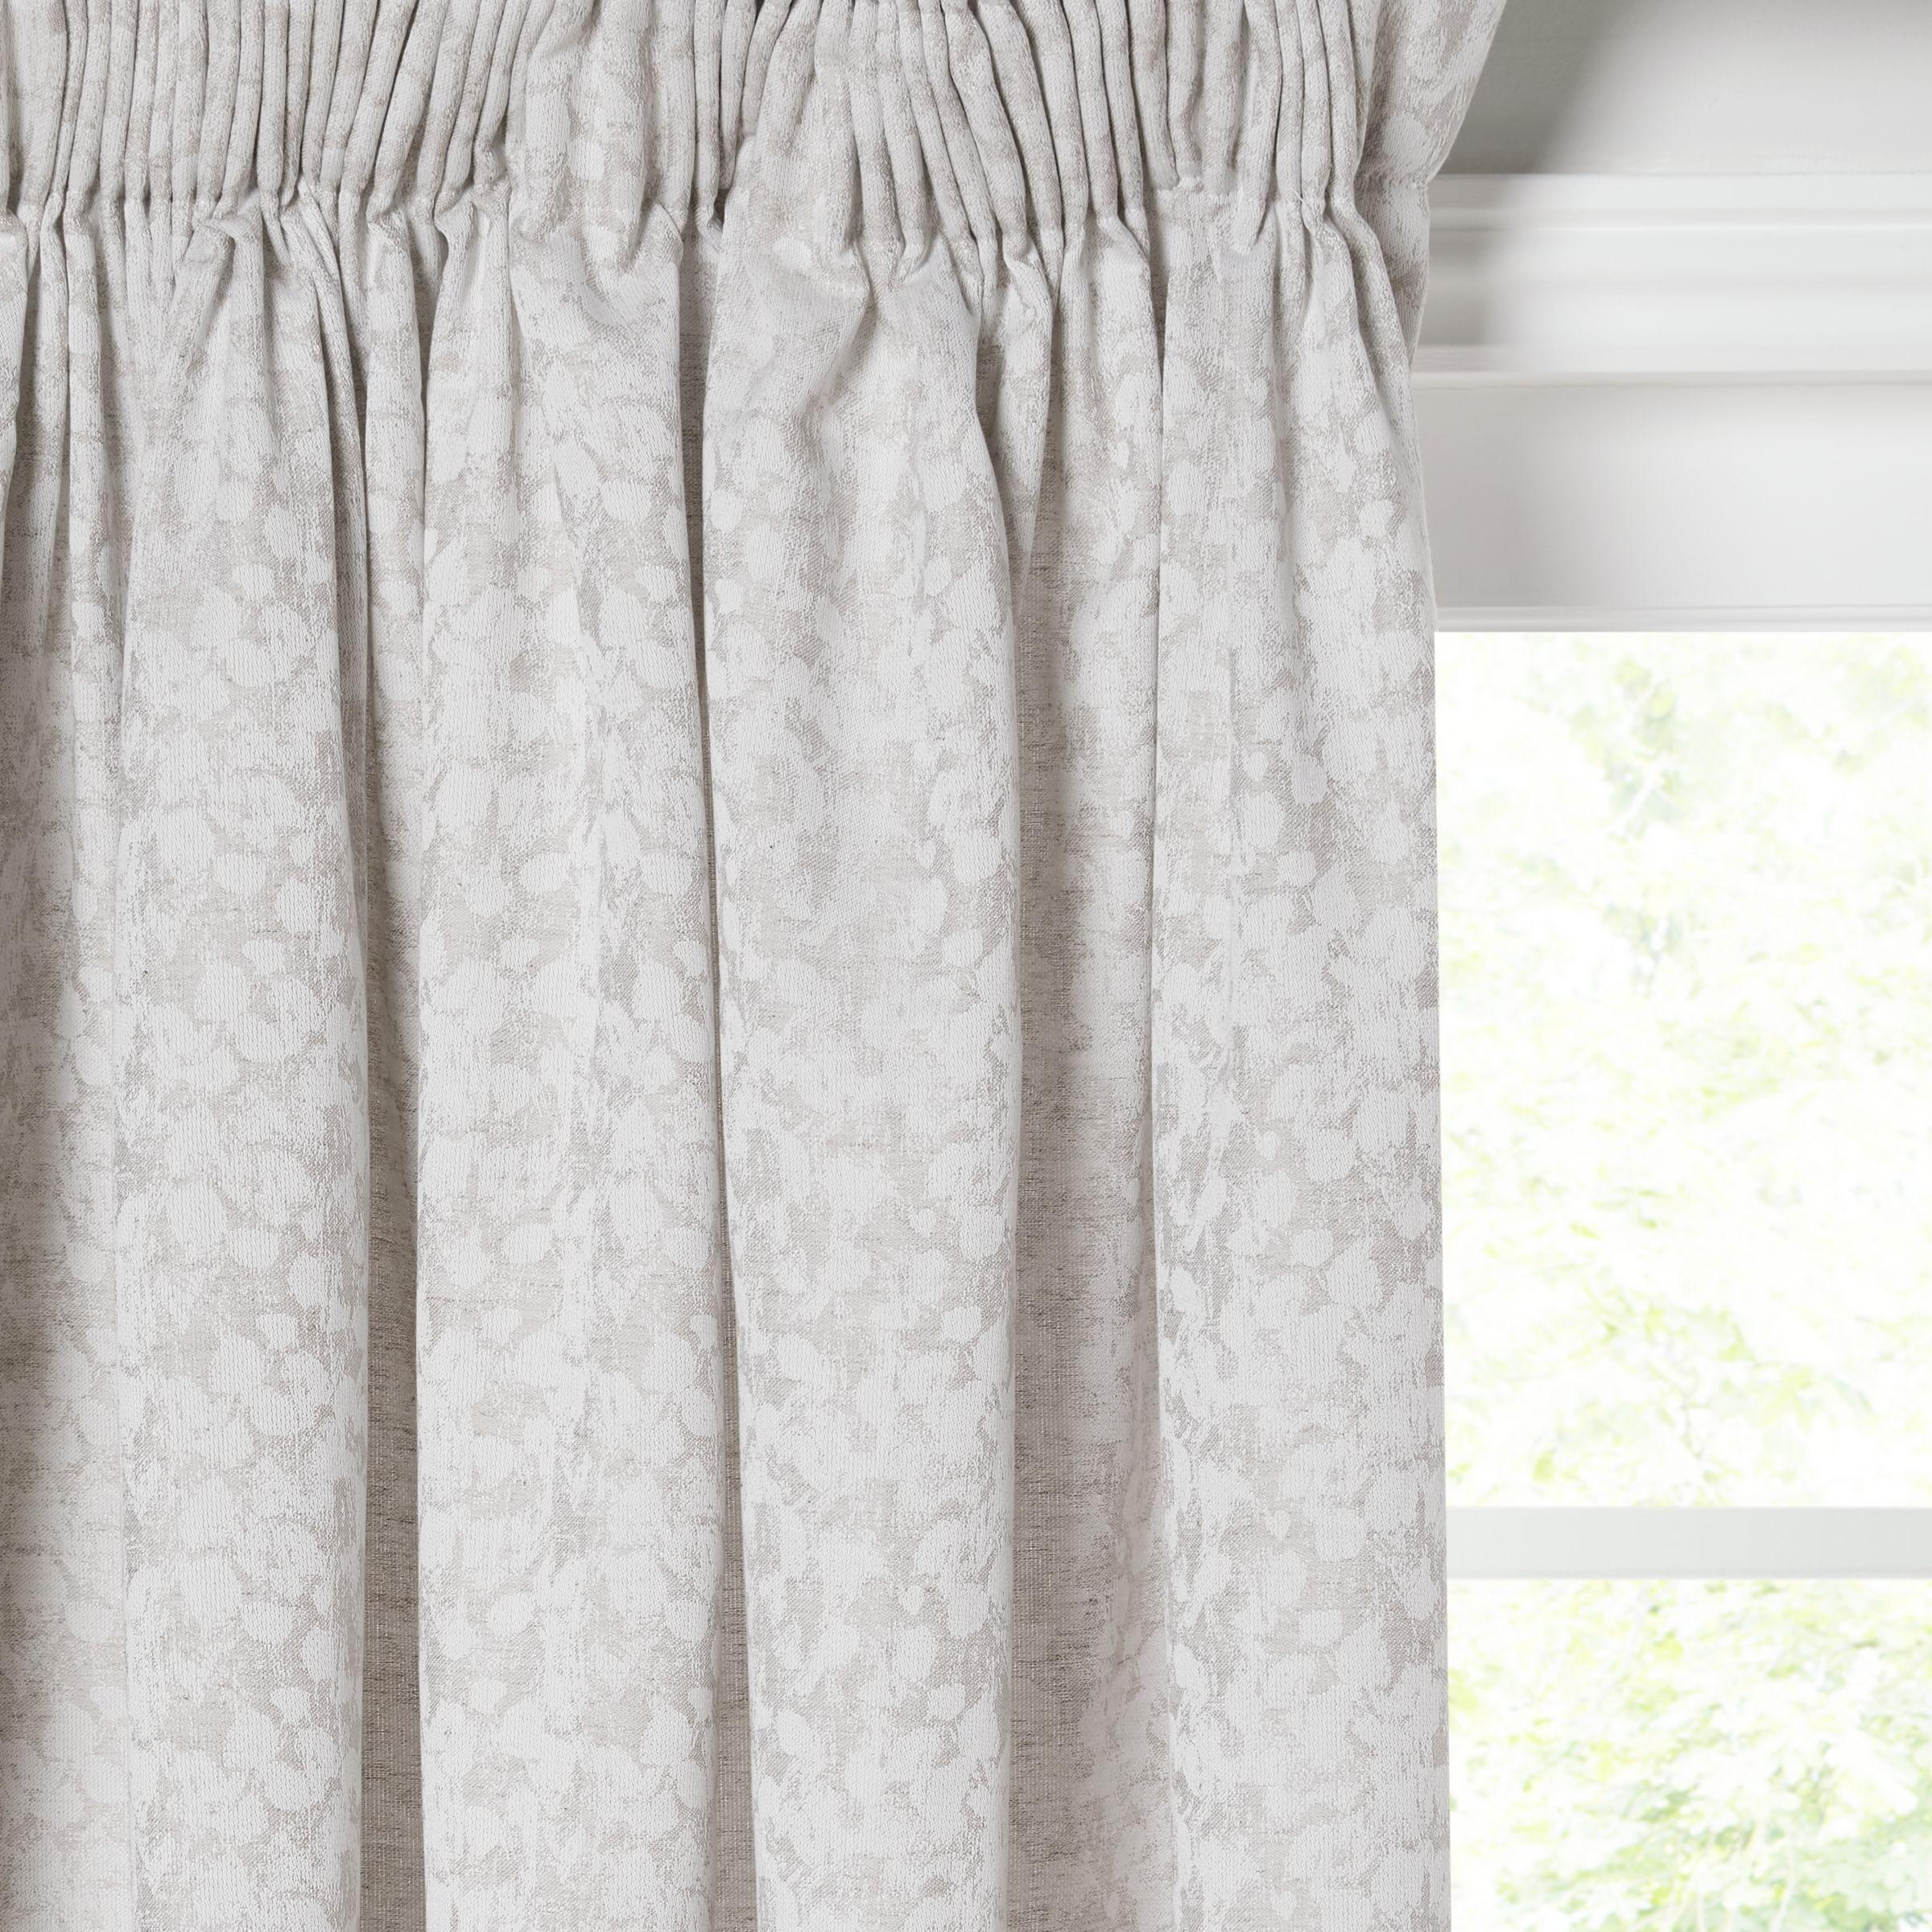 gray panel doors sheer interior patio white sliding lovely for curtains glass light door single curtain linen